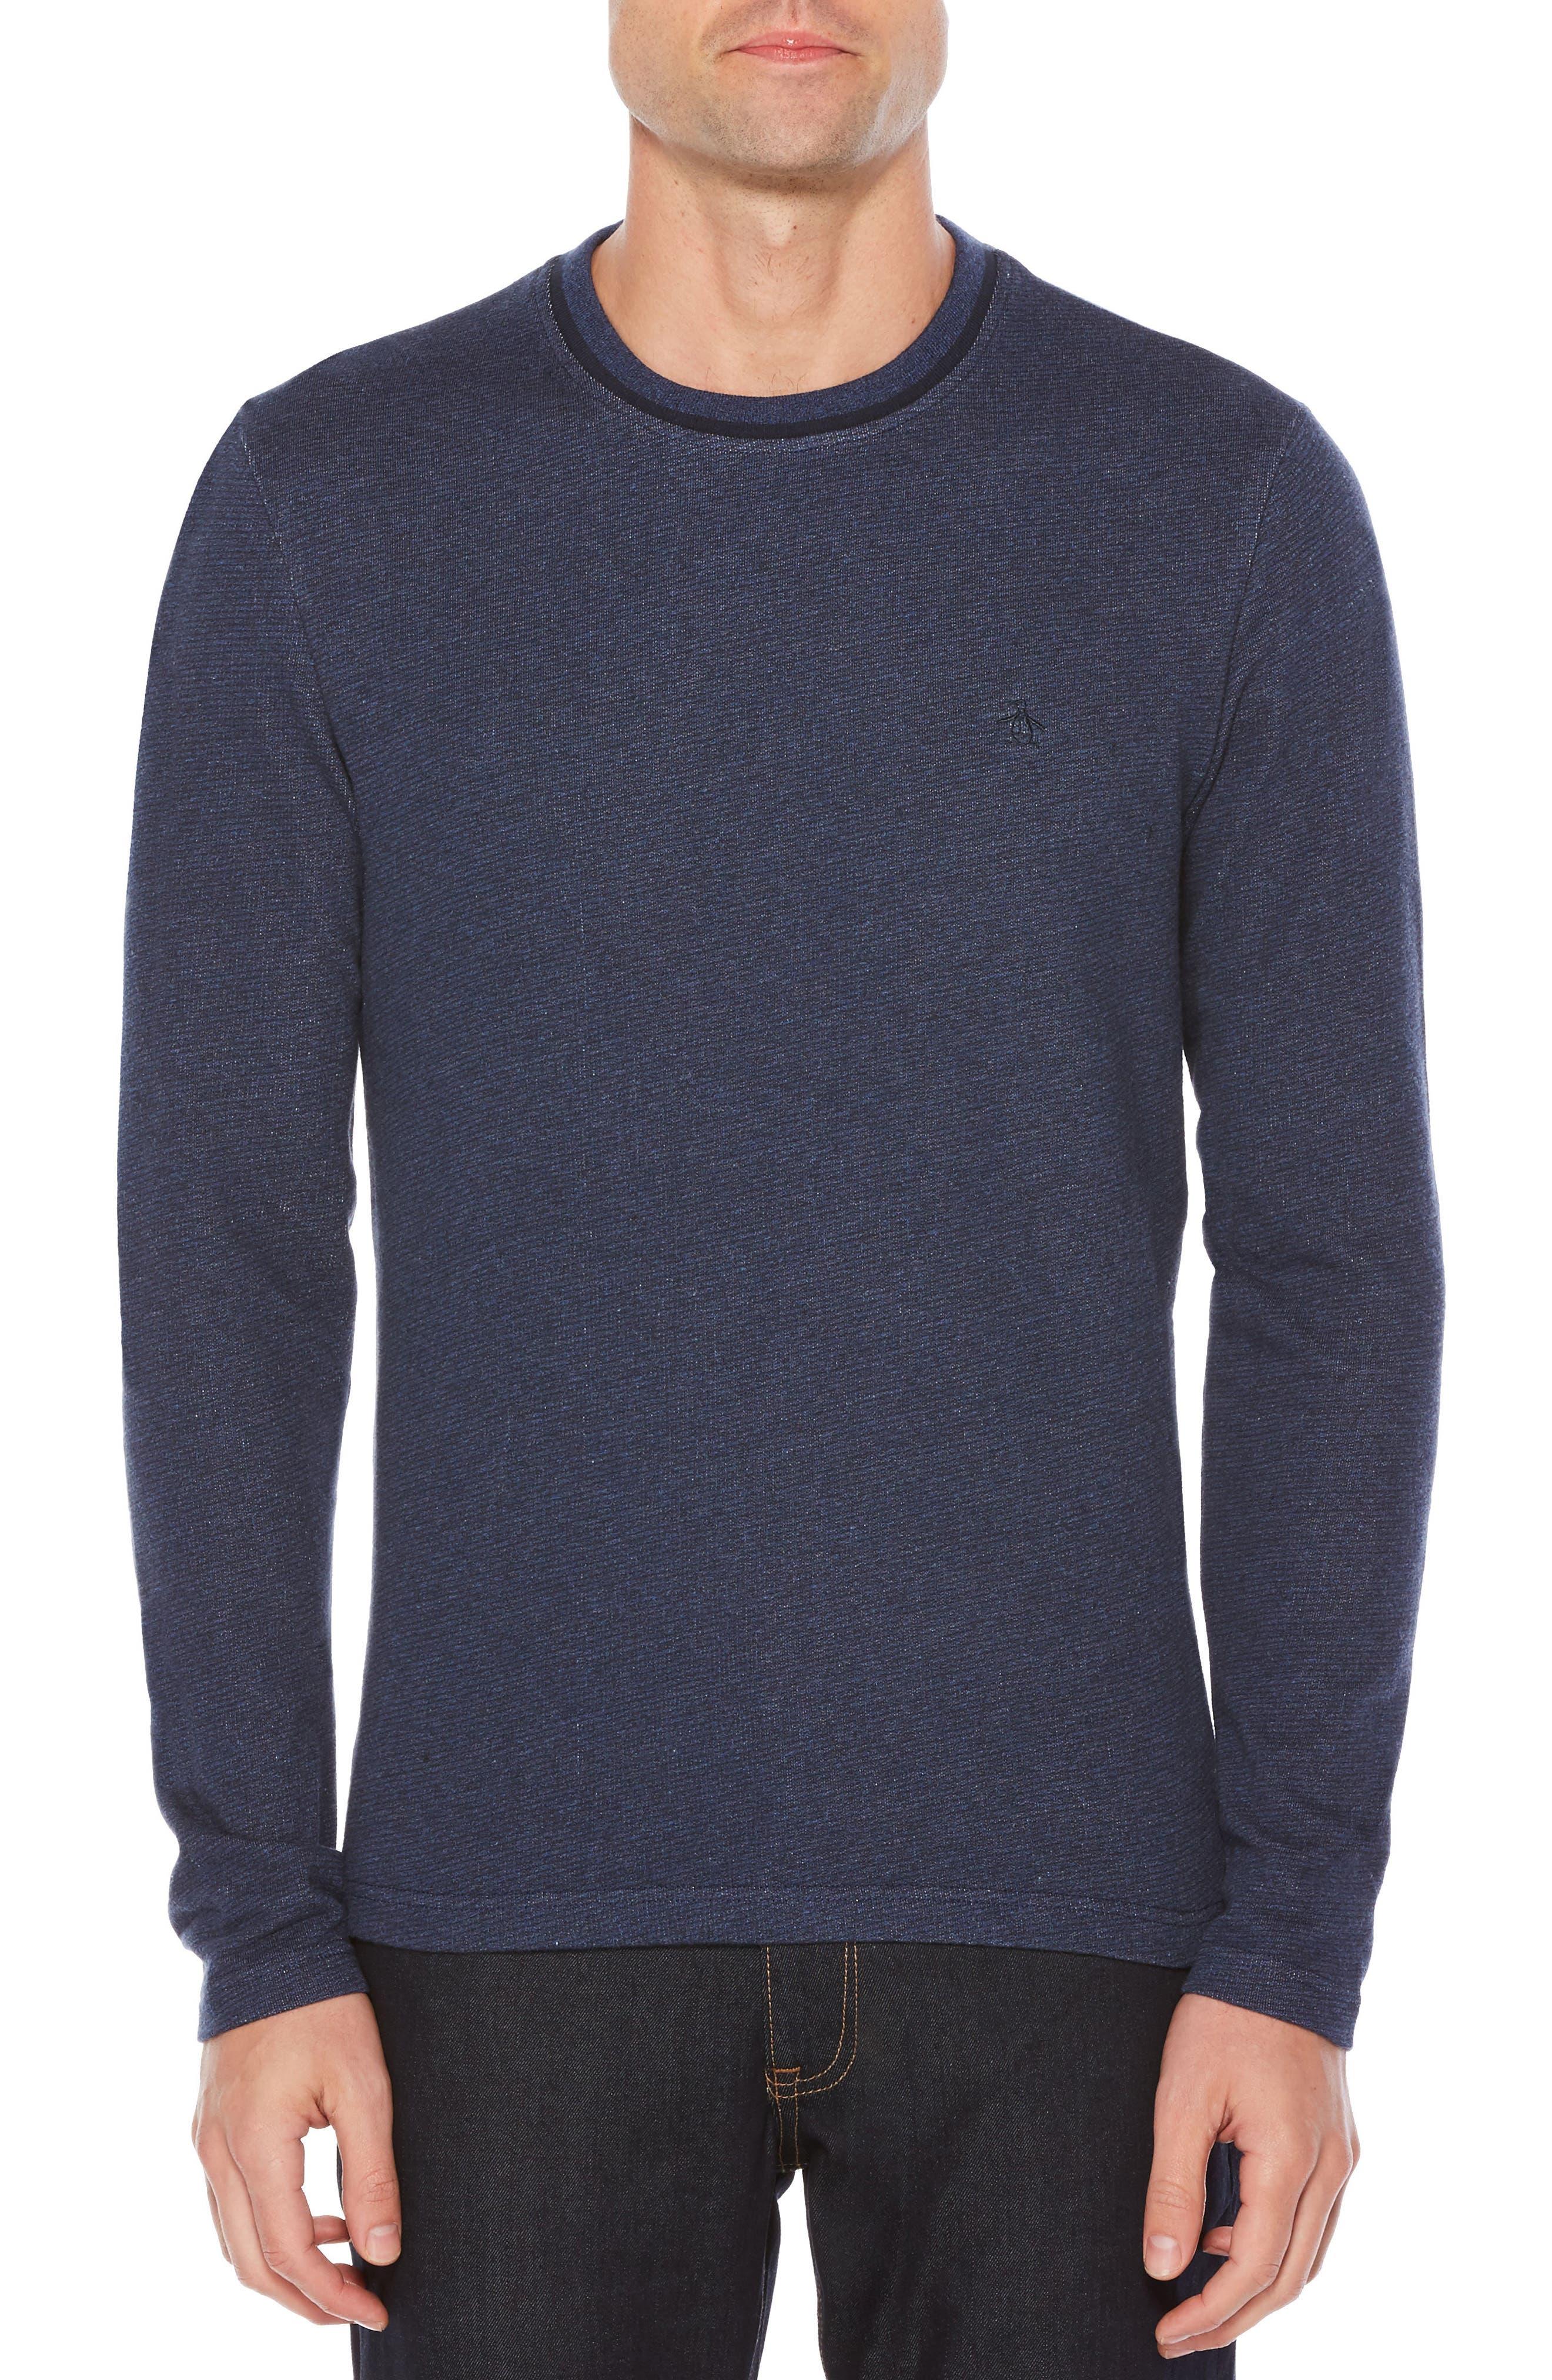 Alternate Image 1 Selected - Original Penguin Jaspé Terry Long Sleeve T-Shirt